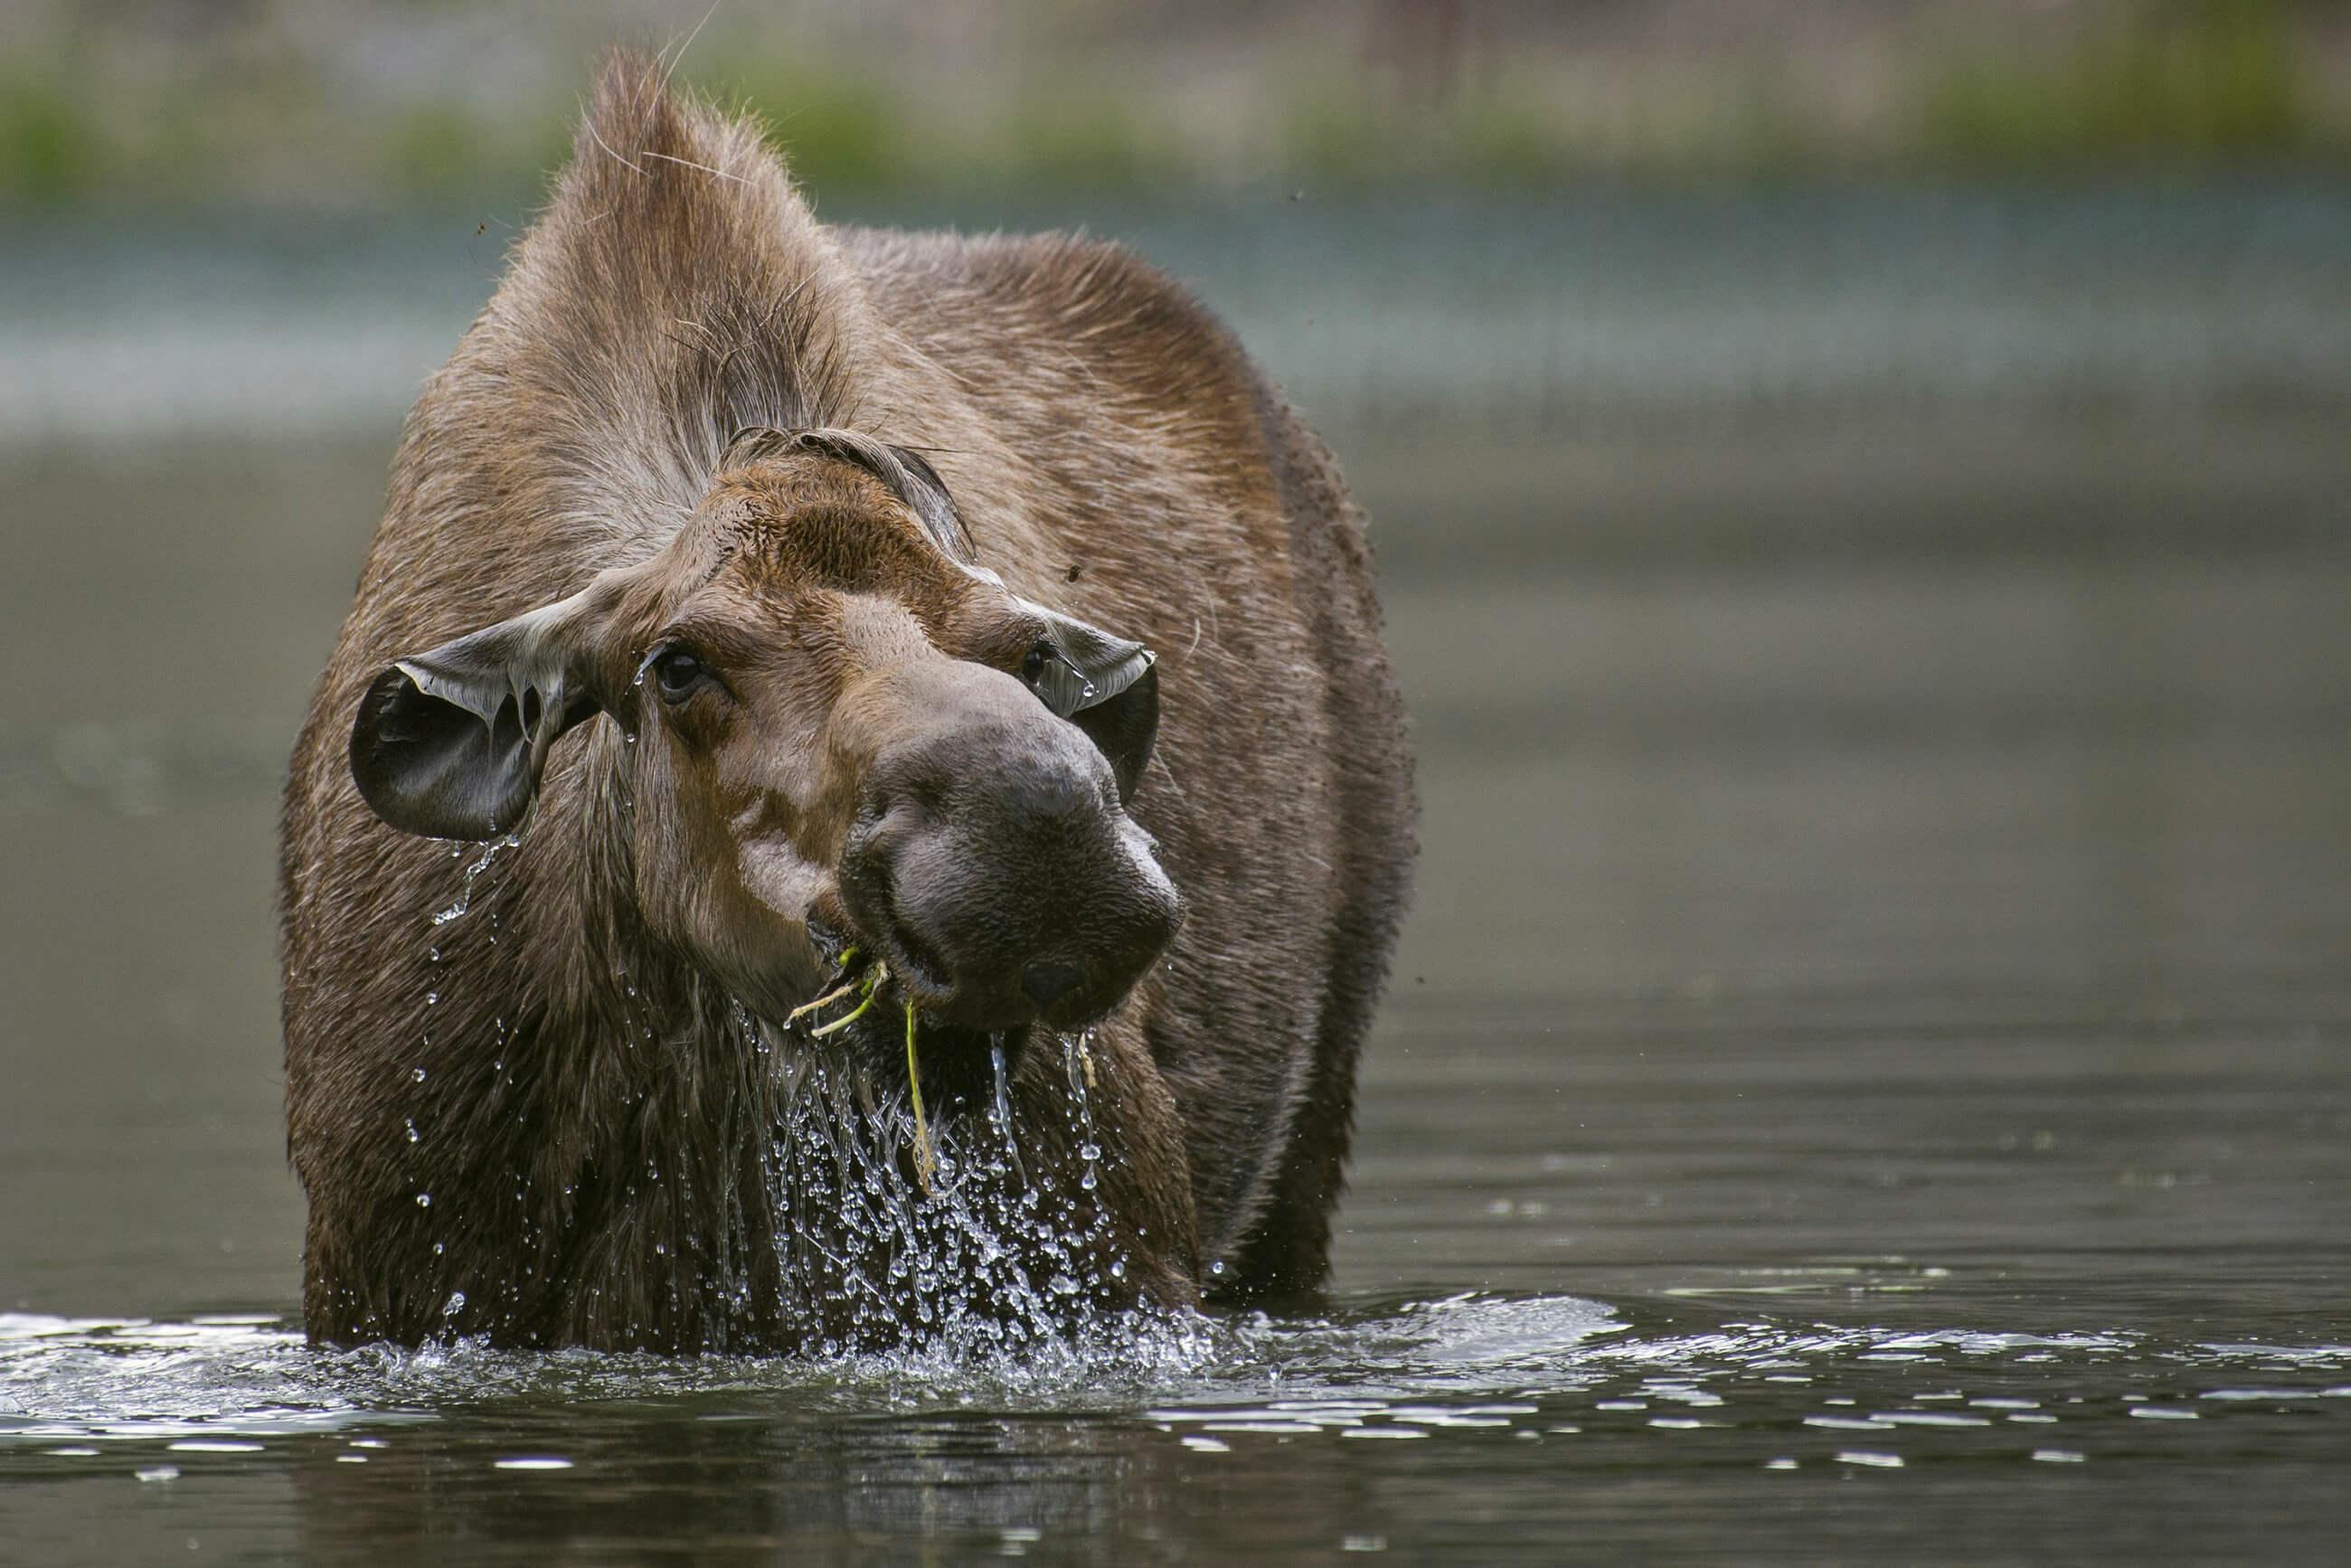 https://bubo.sk/uploads/galleries/16052/pxb_aljaska_moose-3933058-1.jpg